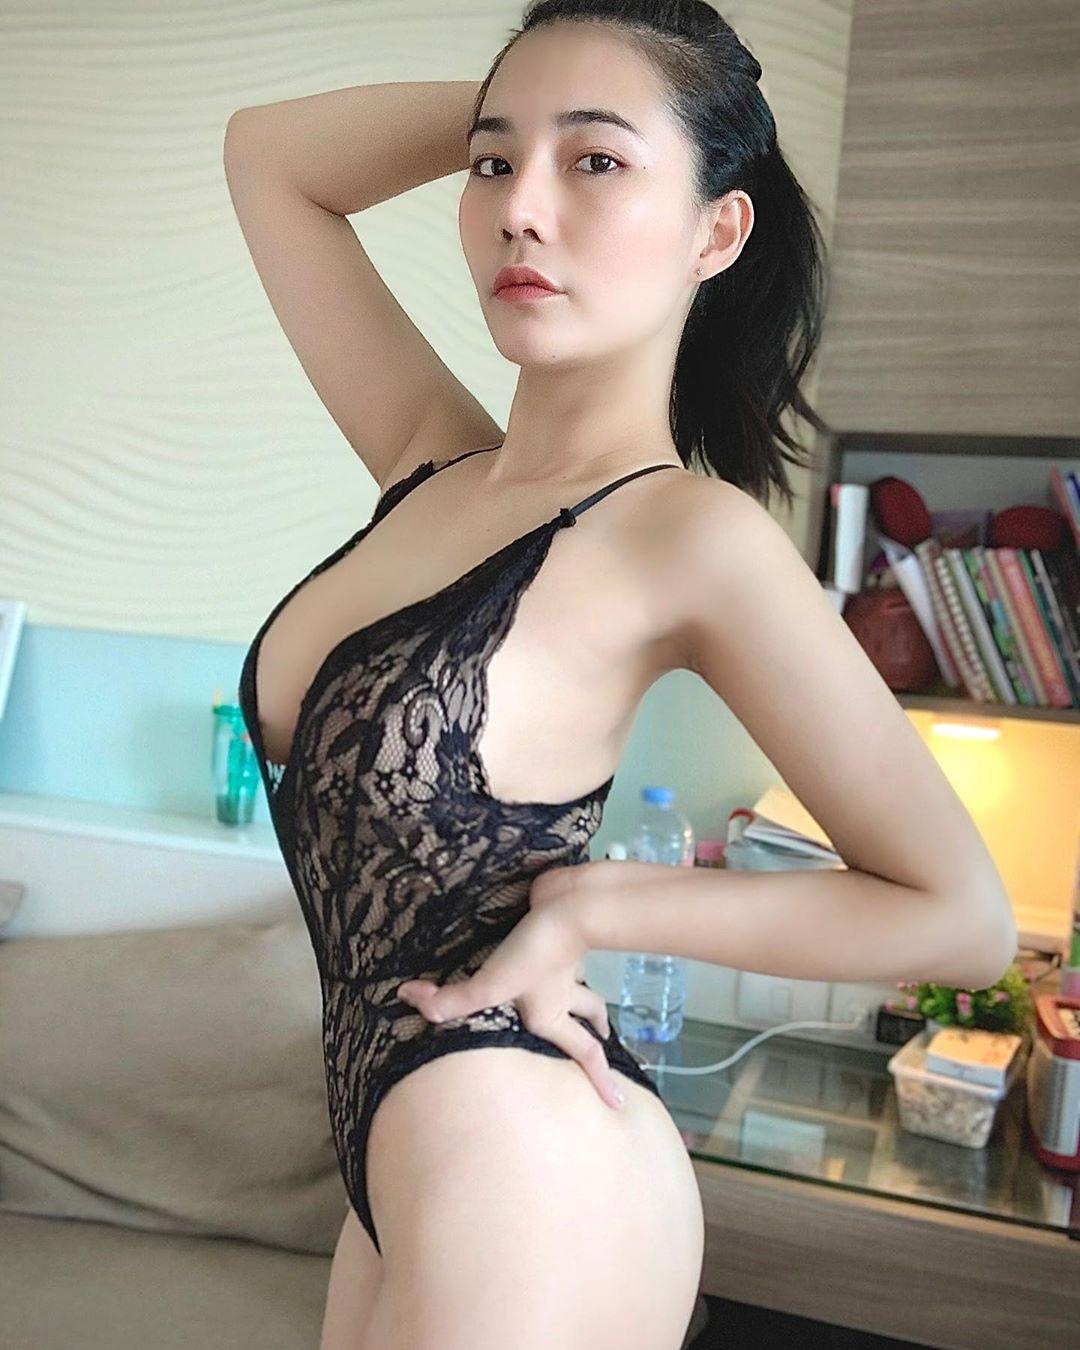 Asian Girl Library No.174 | | Pics Global